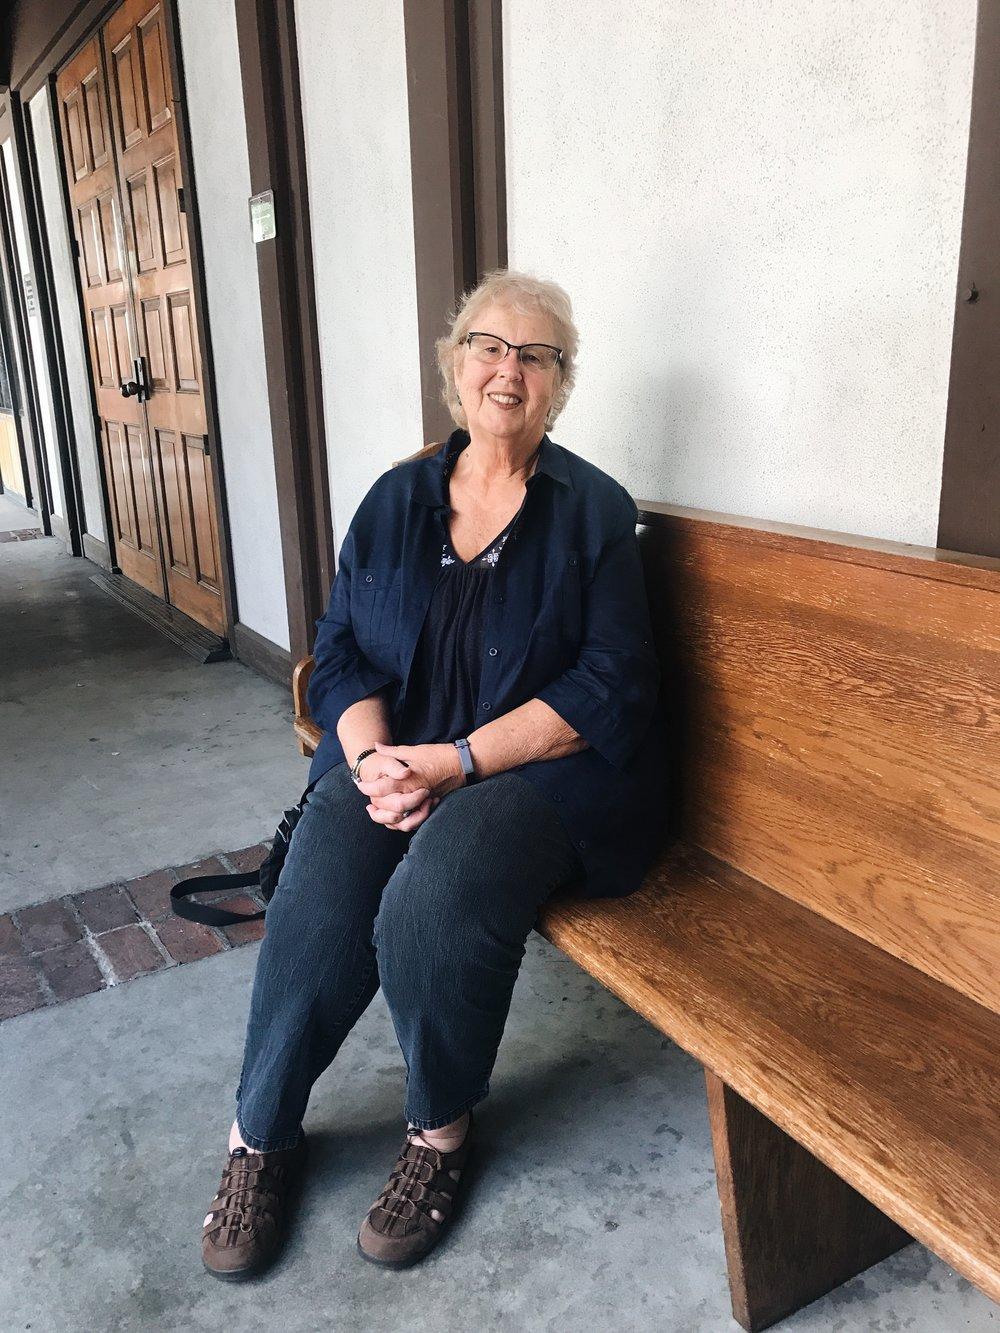 Dr. Norma Chinchilla at St. Luke's Episcopal Church in Long Beach